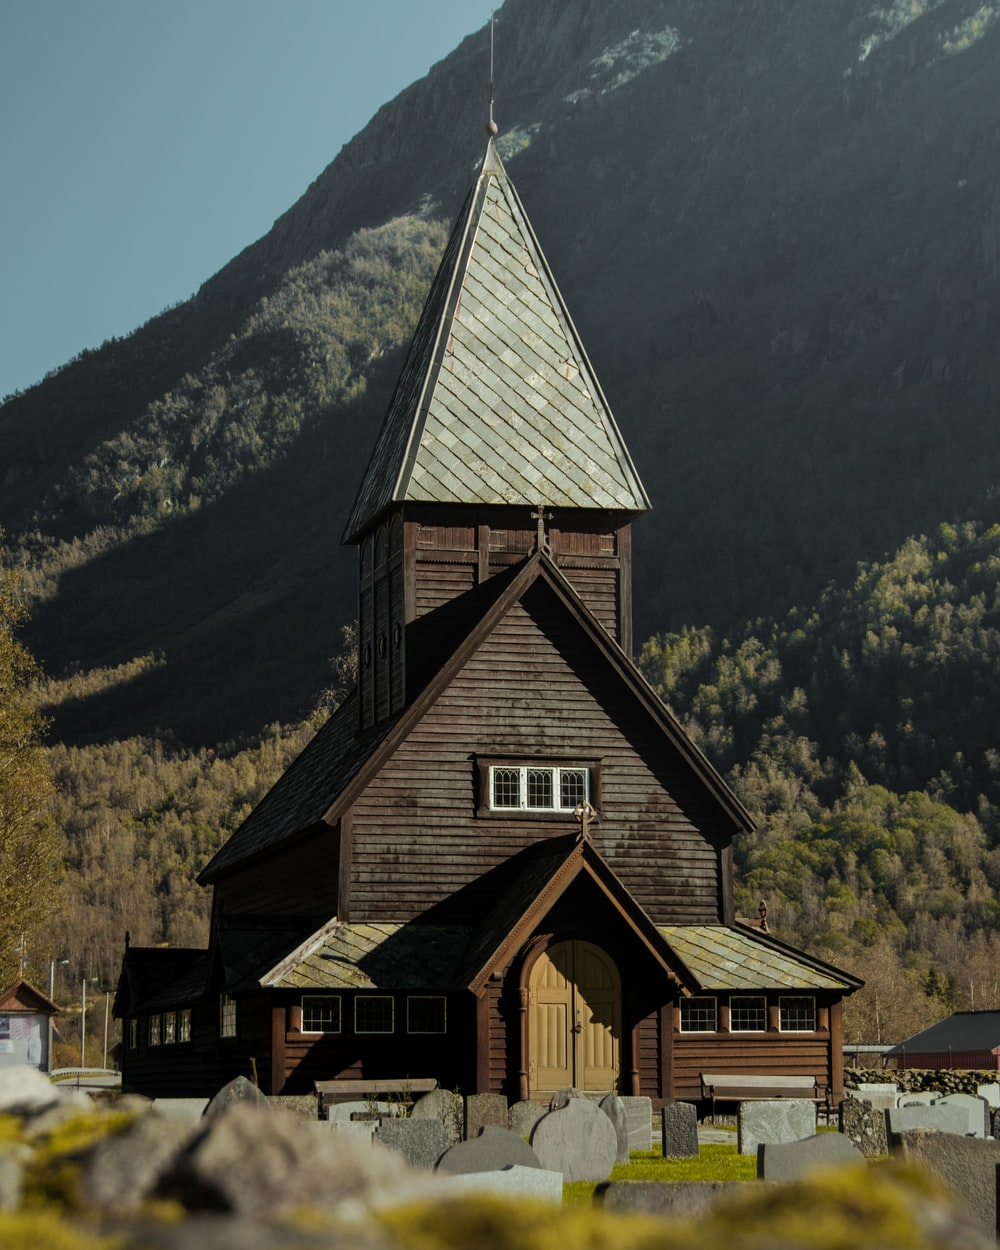 brown wooden church